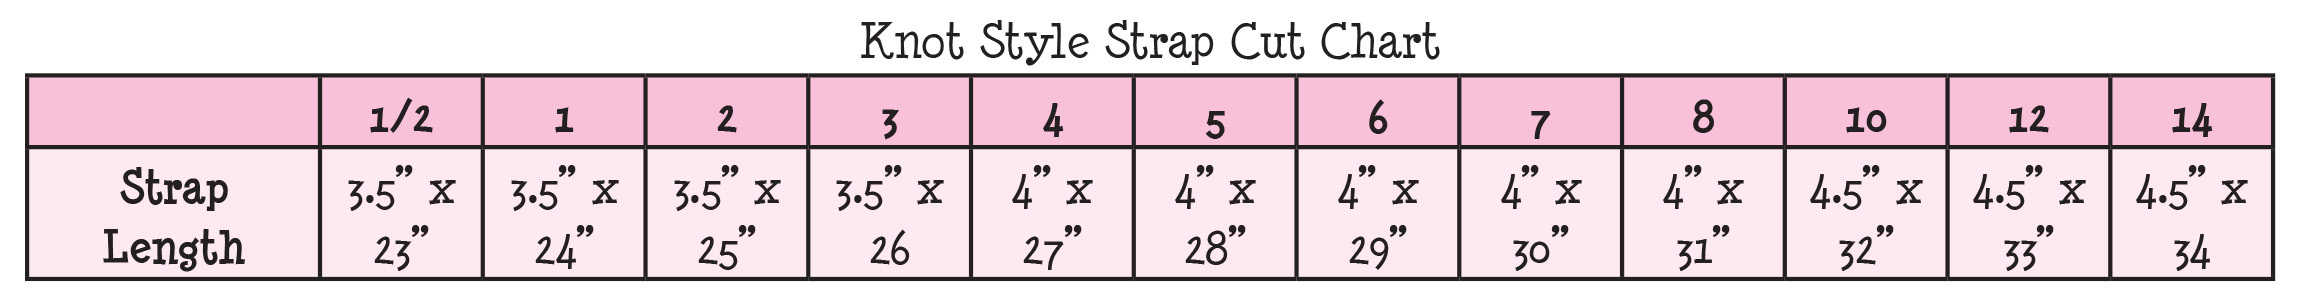 knot style chart